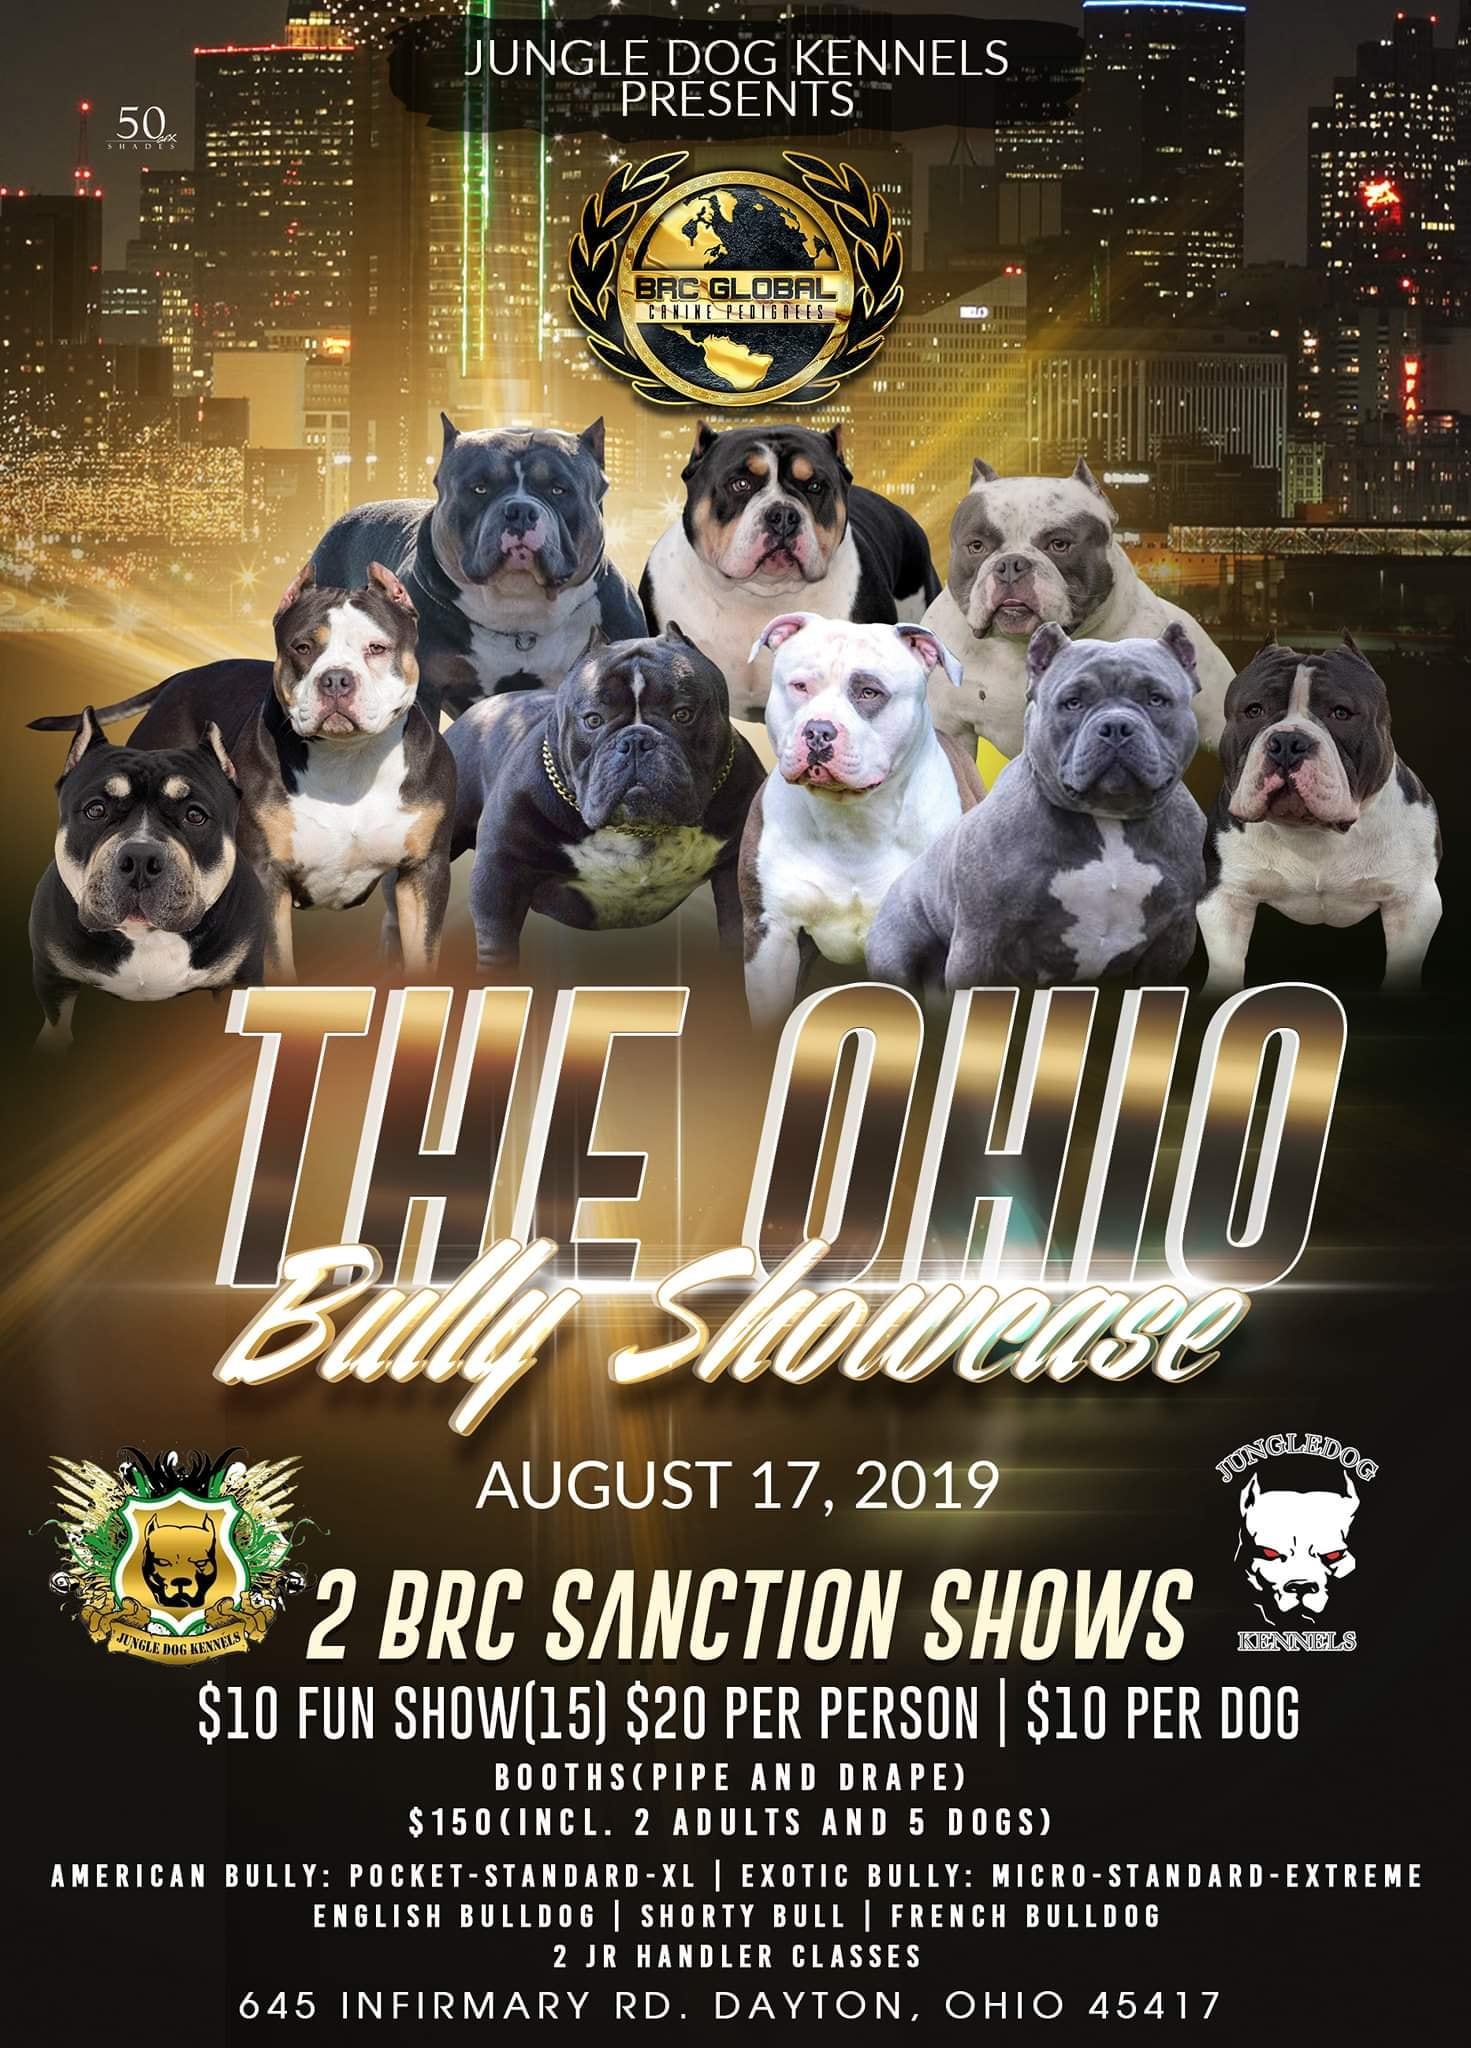 Ohio Bully Showcase – Event Center Bdg 1 | Montgomery County